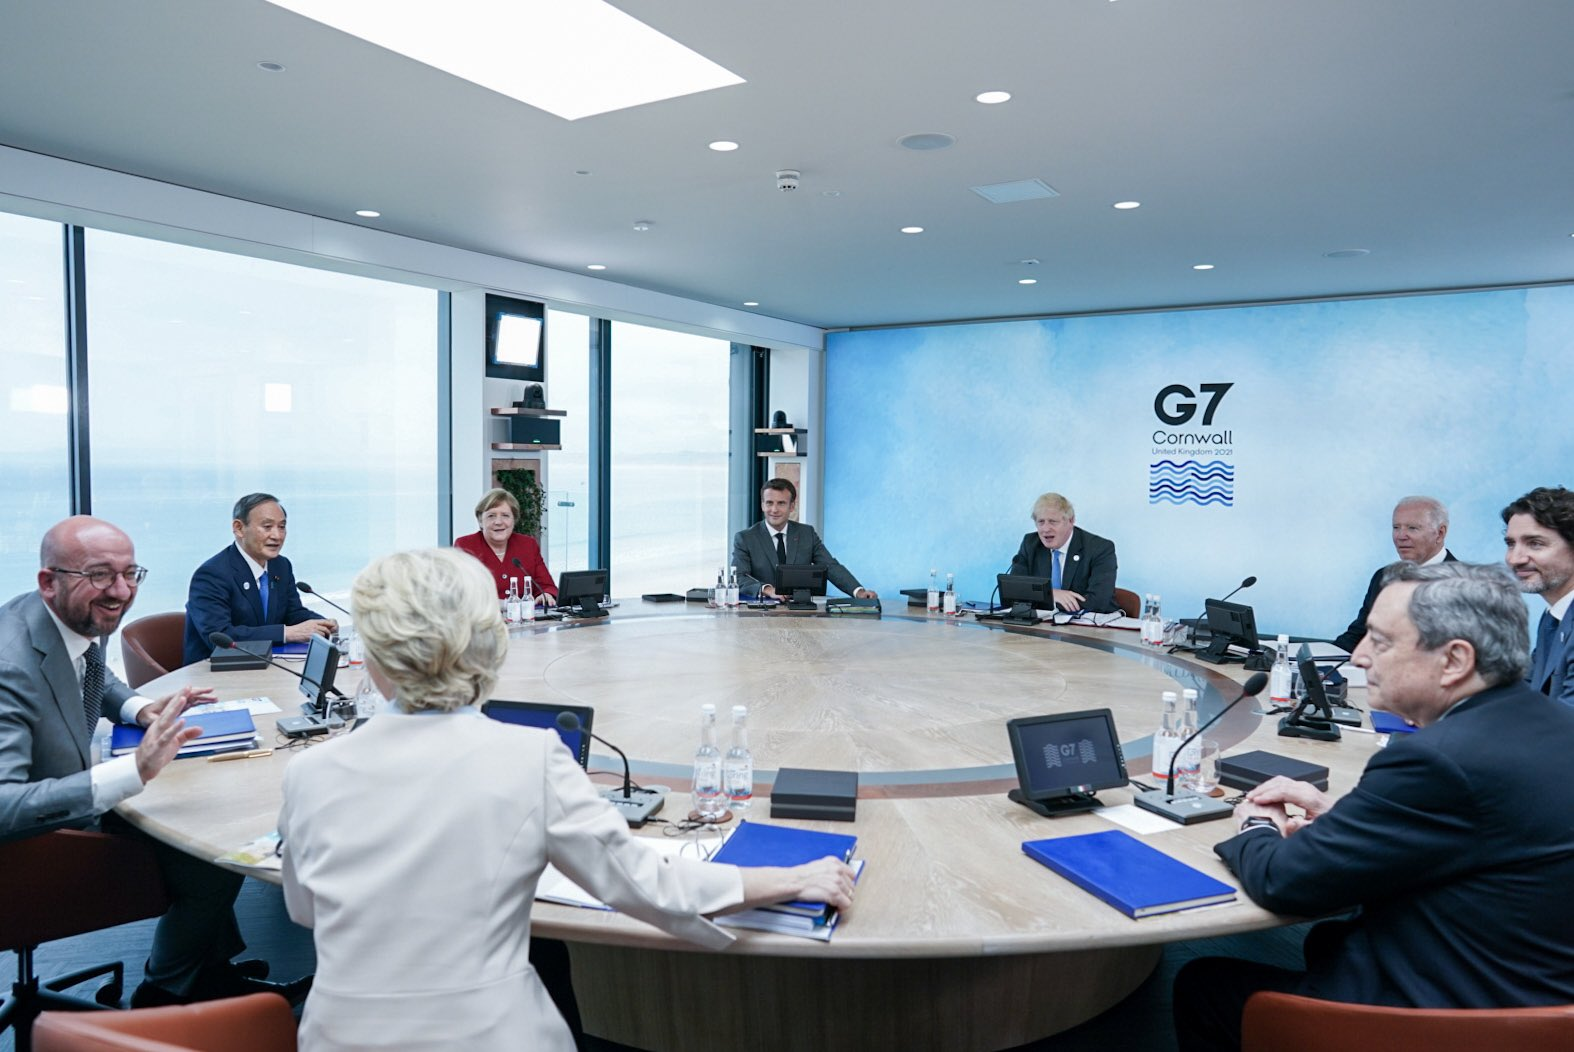 G7 prepara plan para acelerar respuesta a futuras pandemias